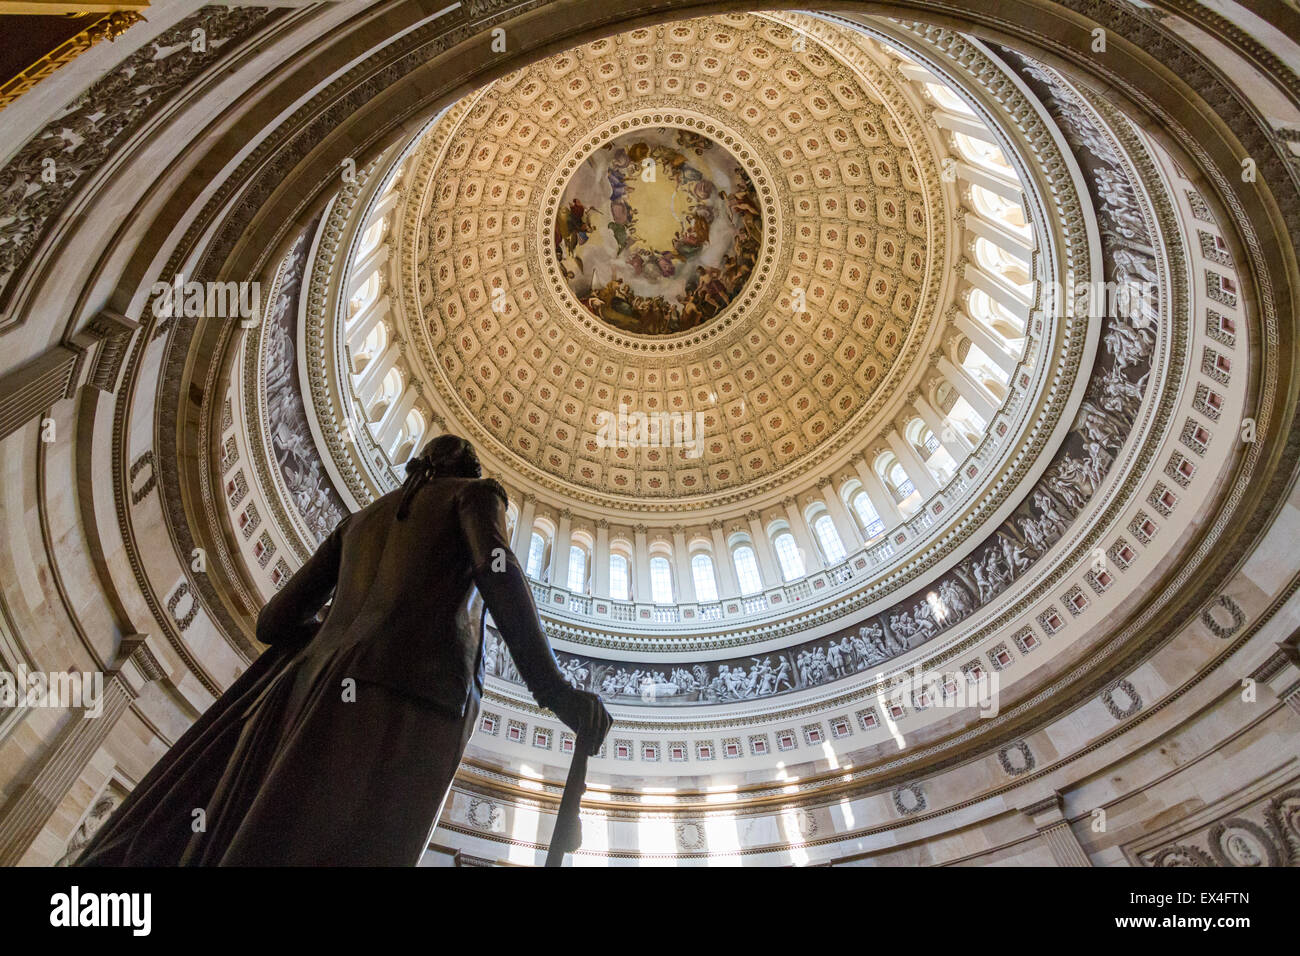 Statue of George Washington within the rotunda of the U.S. Capitol building in Washington D.C. - Stock Image